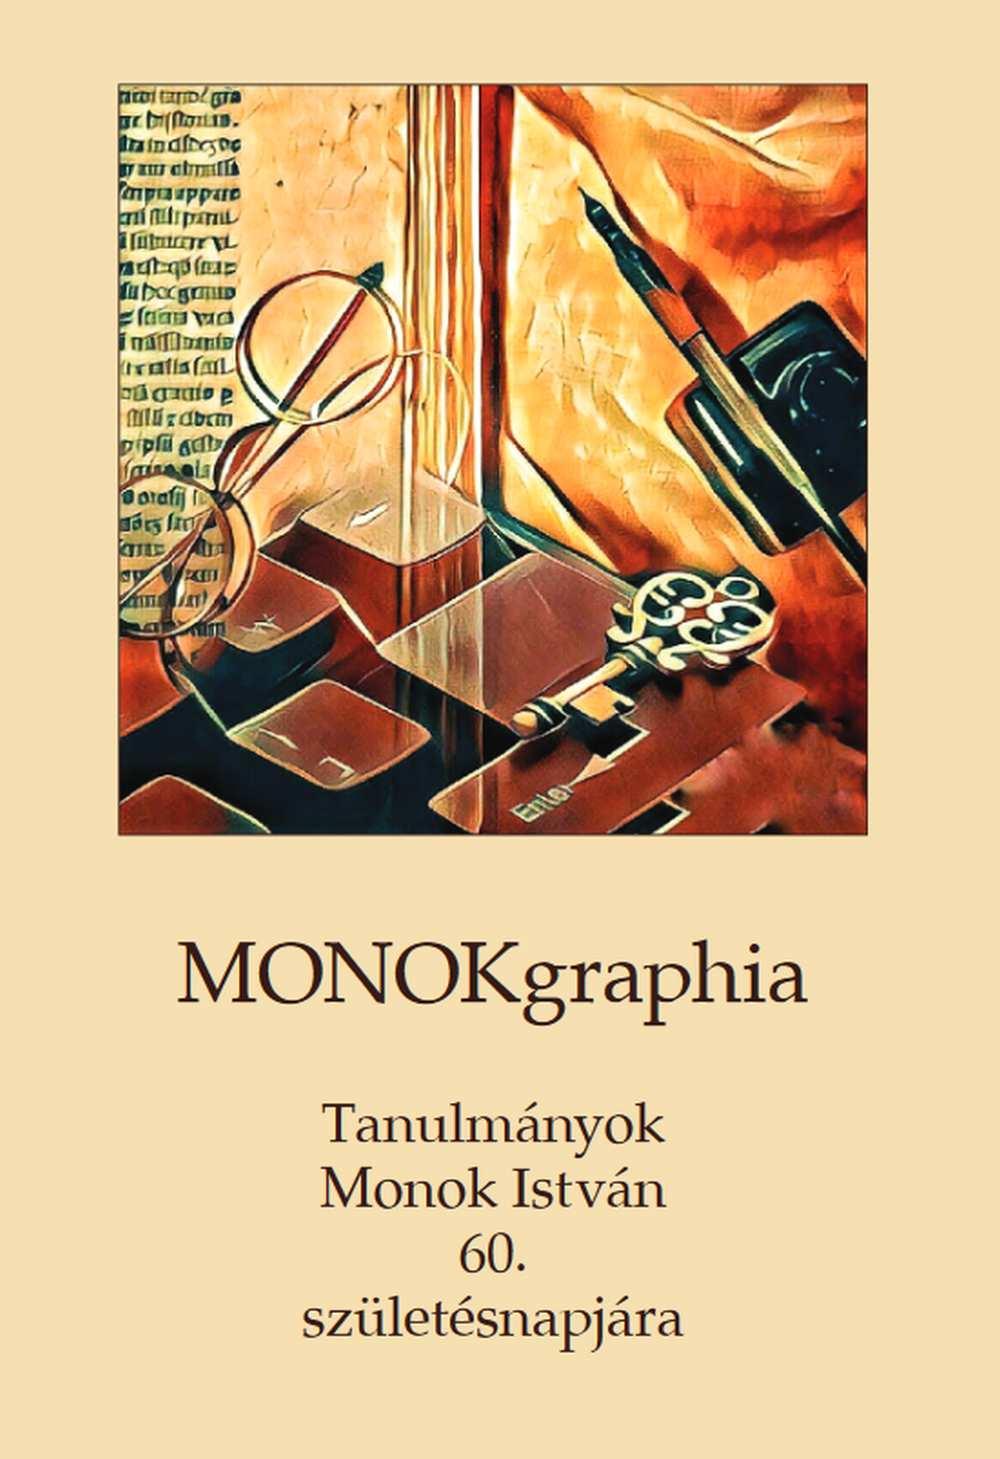 monok2_tanulmanykotet_opti.jpg